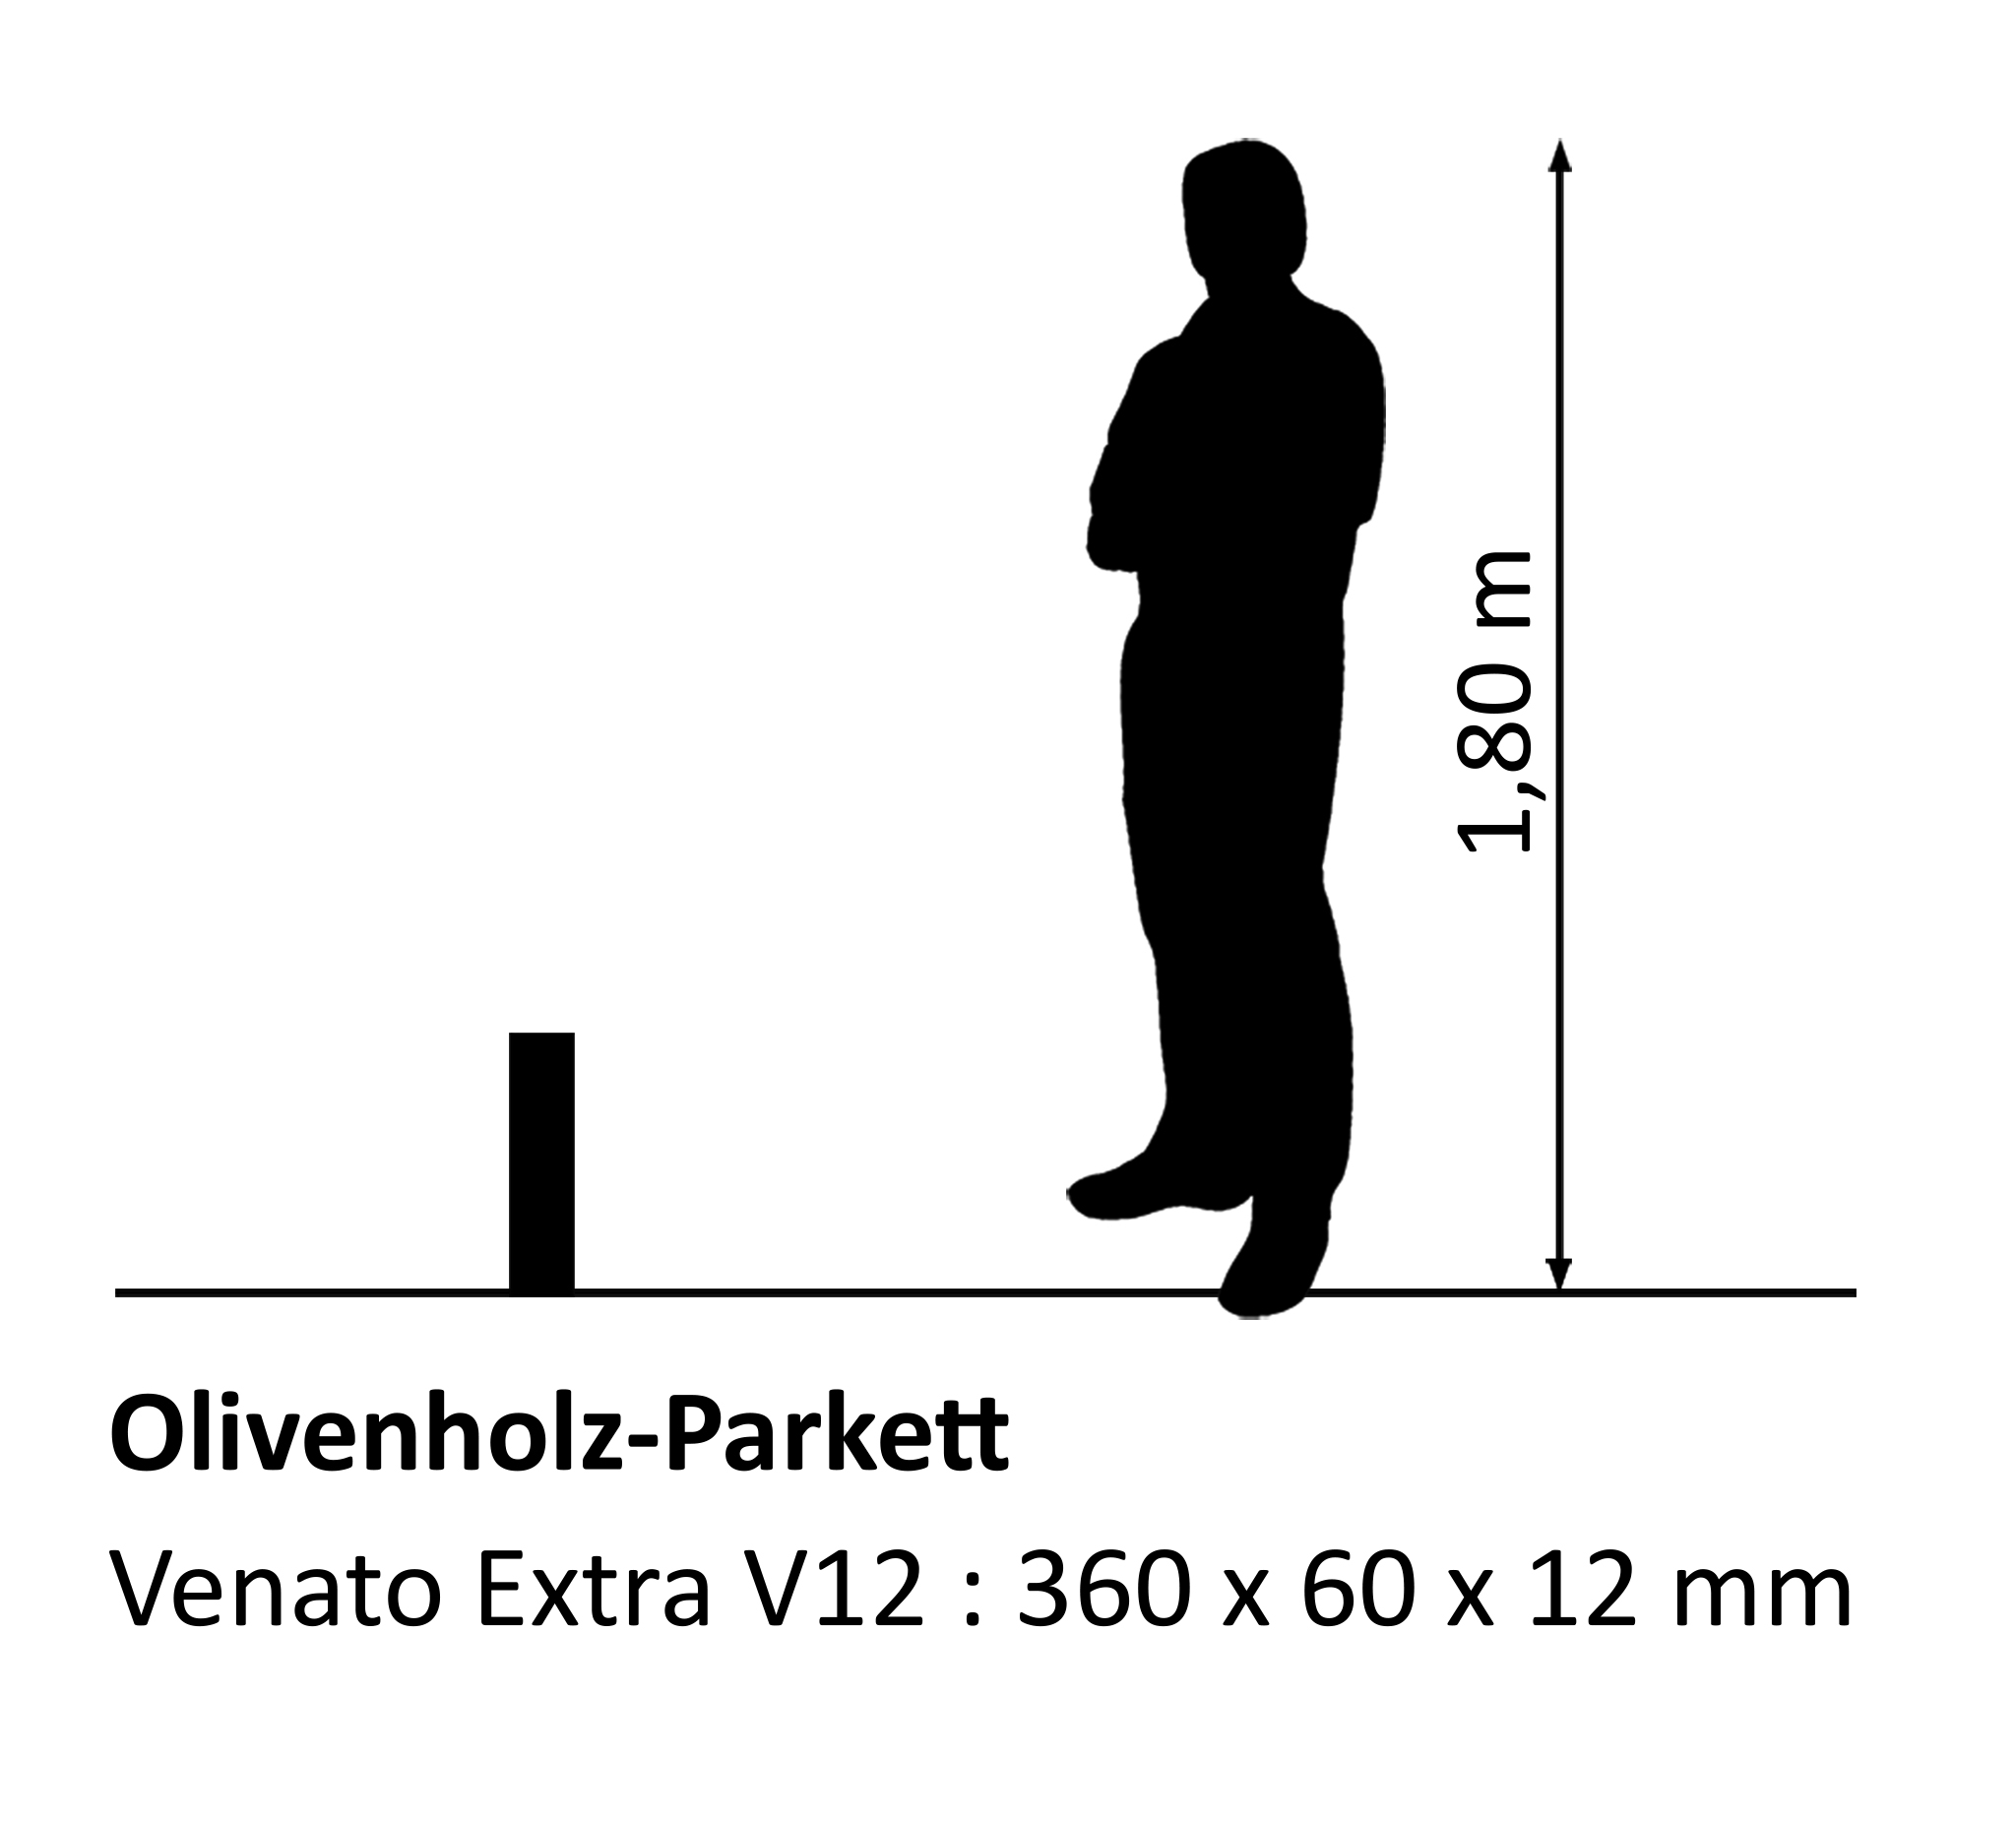 Olivenholzparkett Venato Extra V12